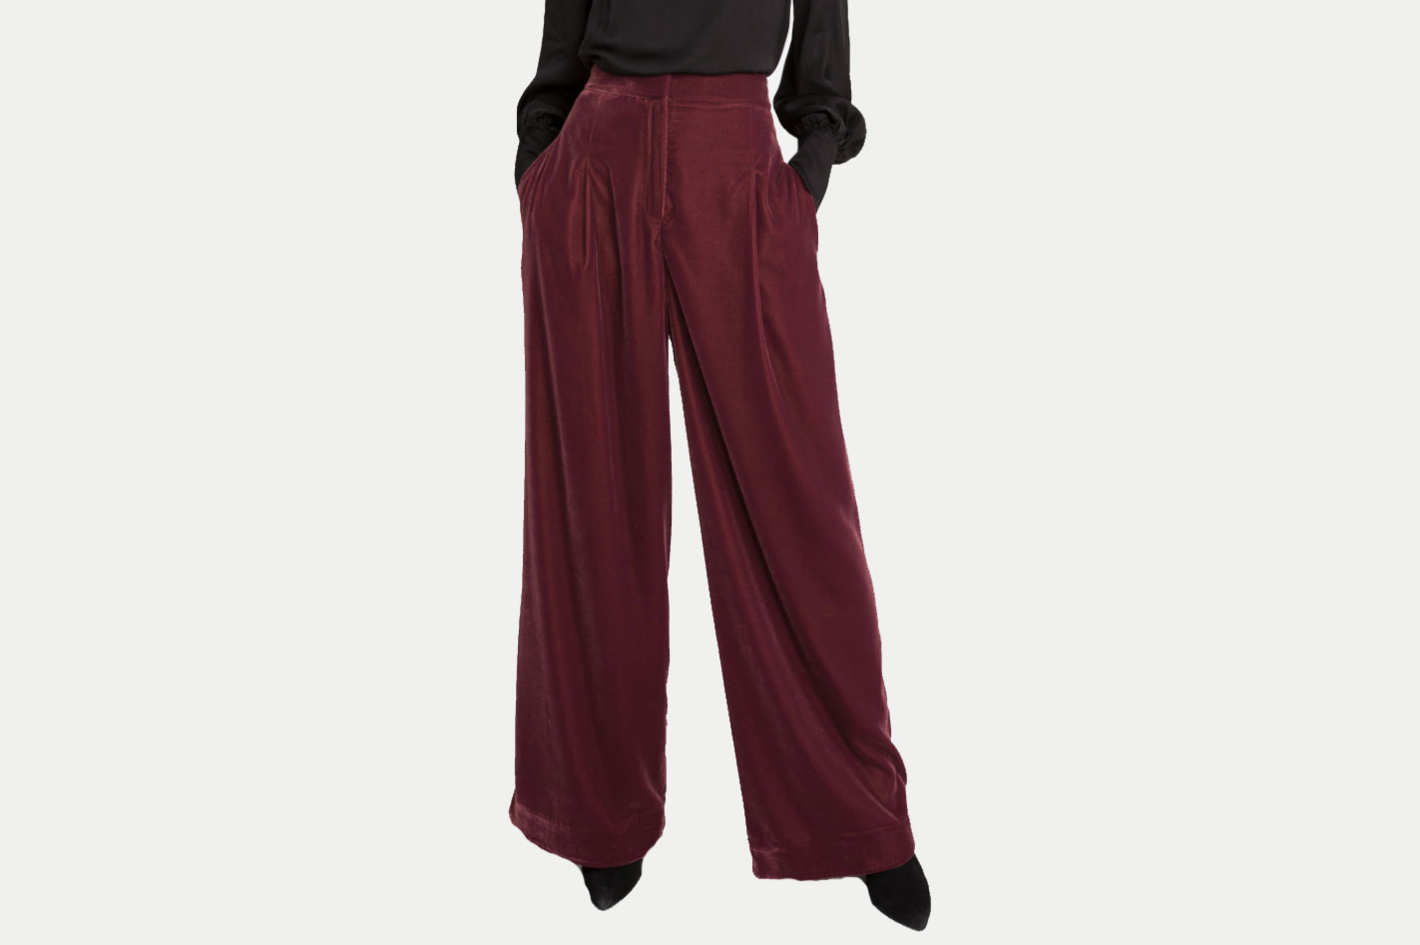 & Other Stories High Waisted Velvet Pants